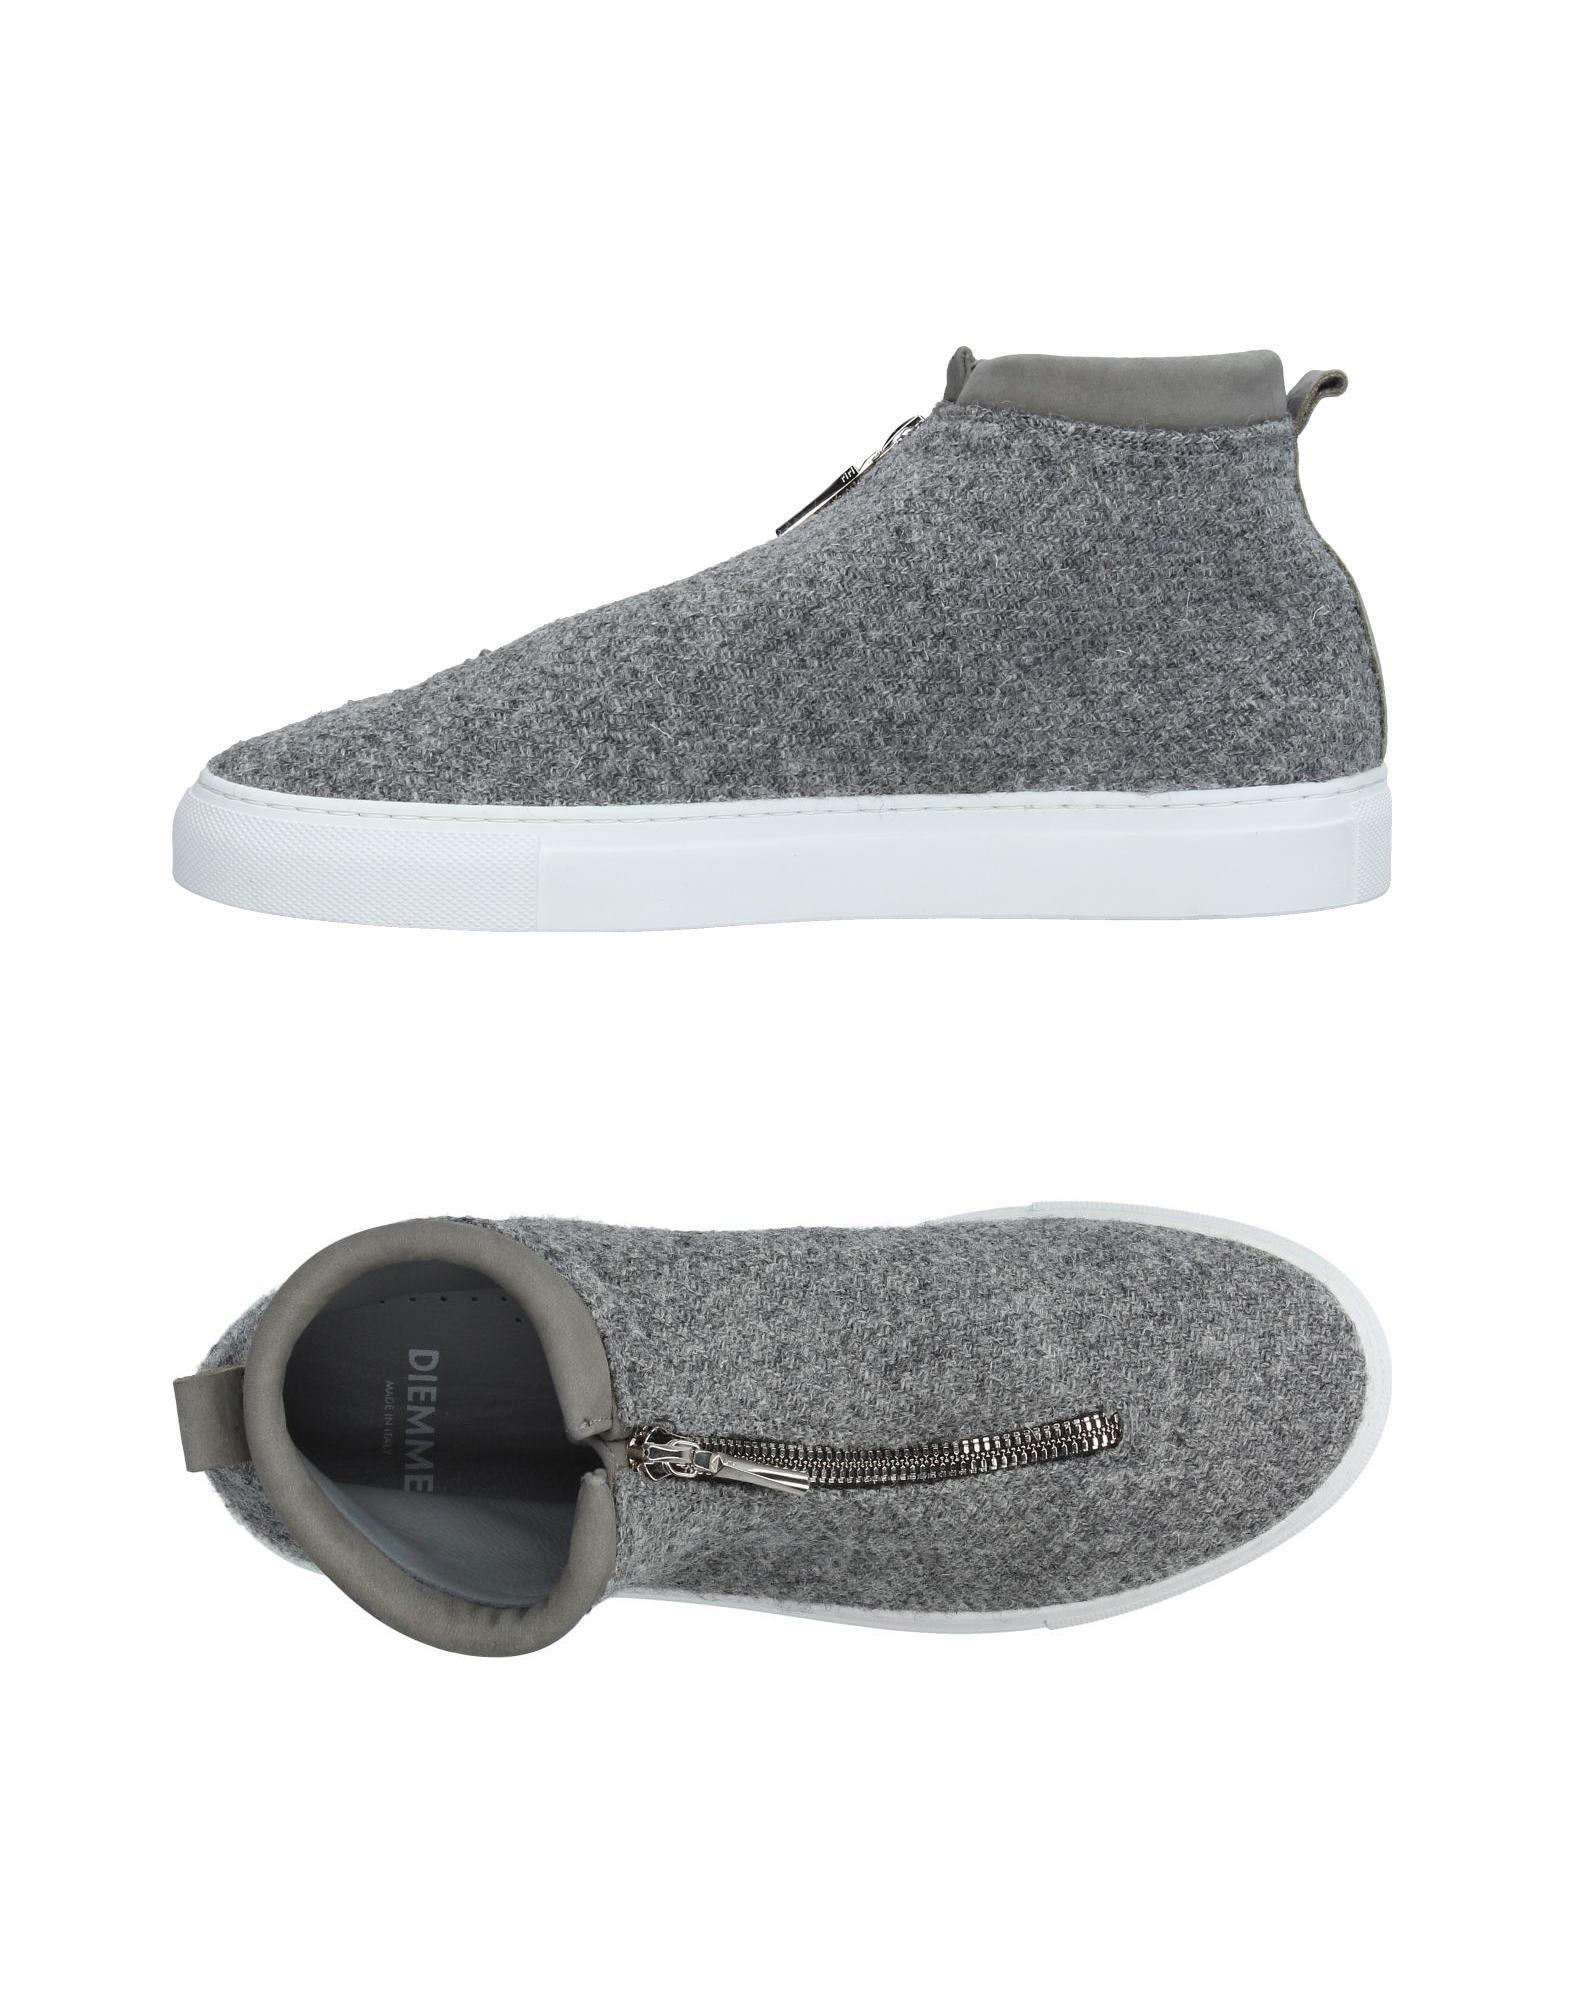 Moda Sneakers Diemme Uomo - 11223937VQ